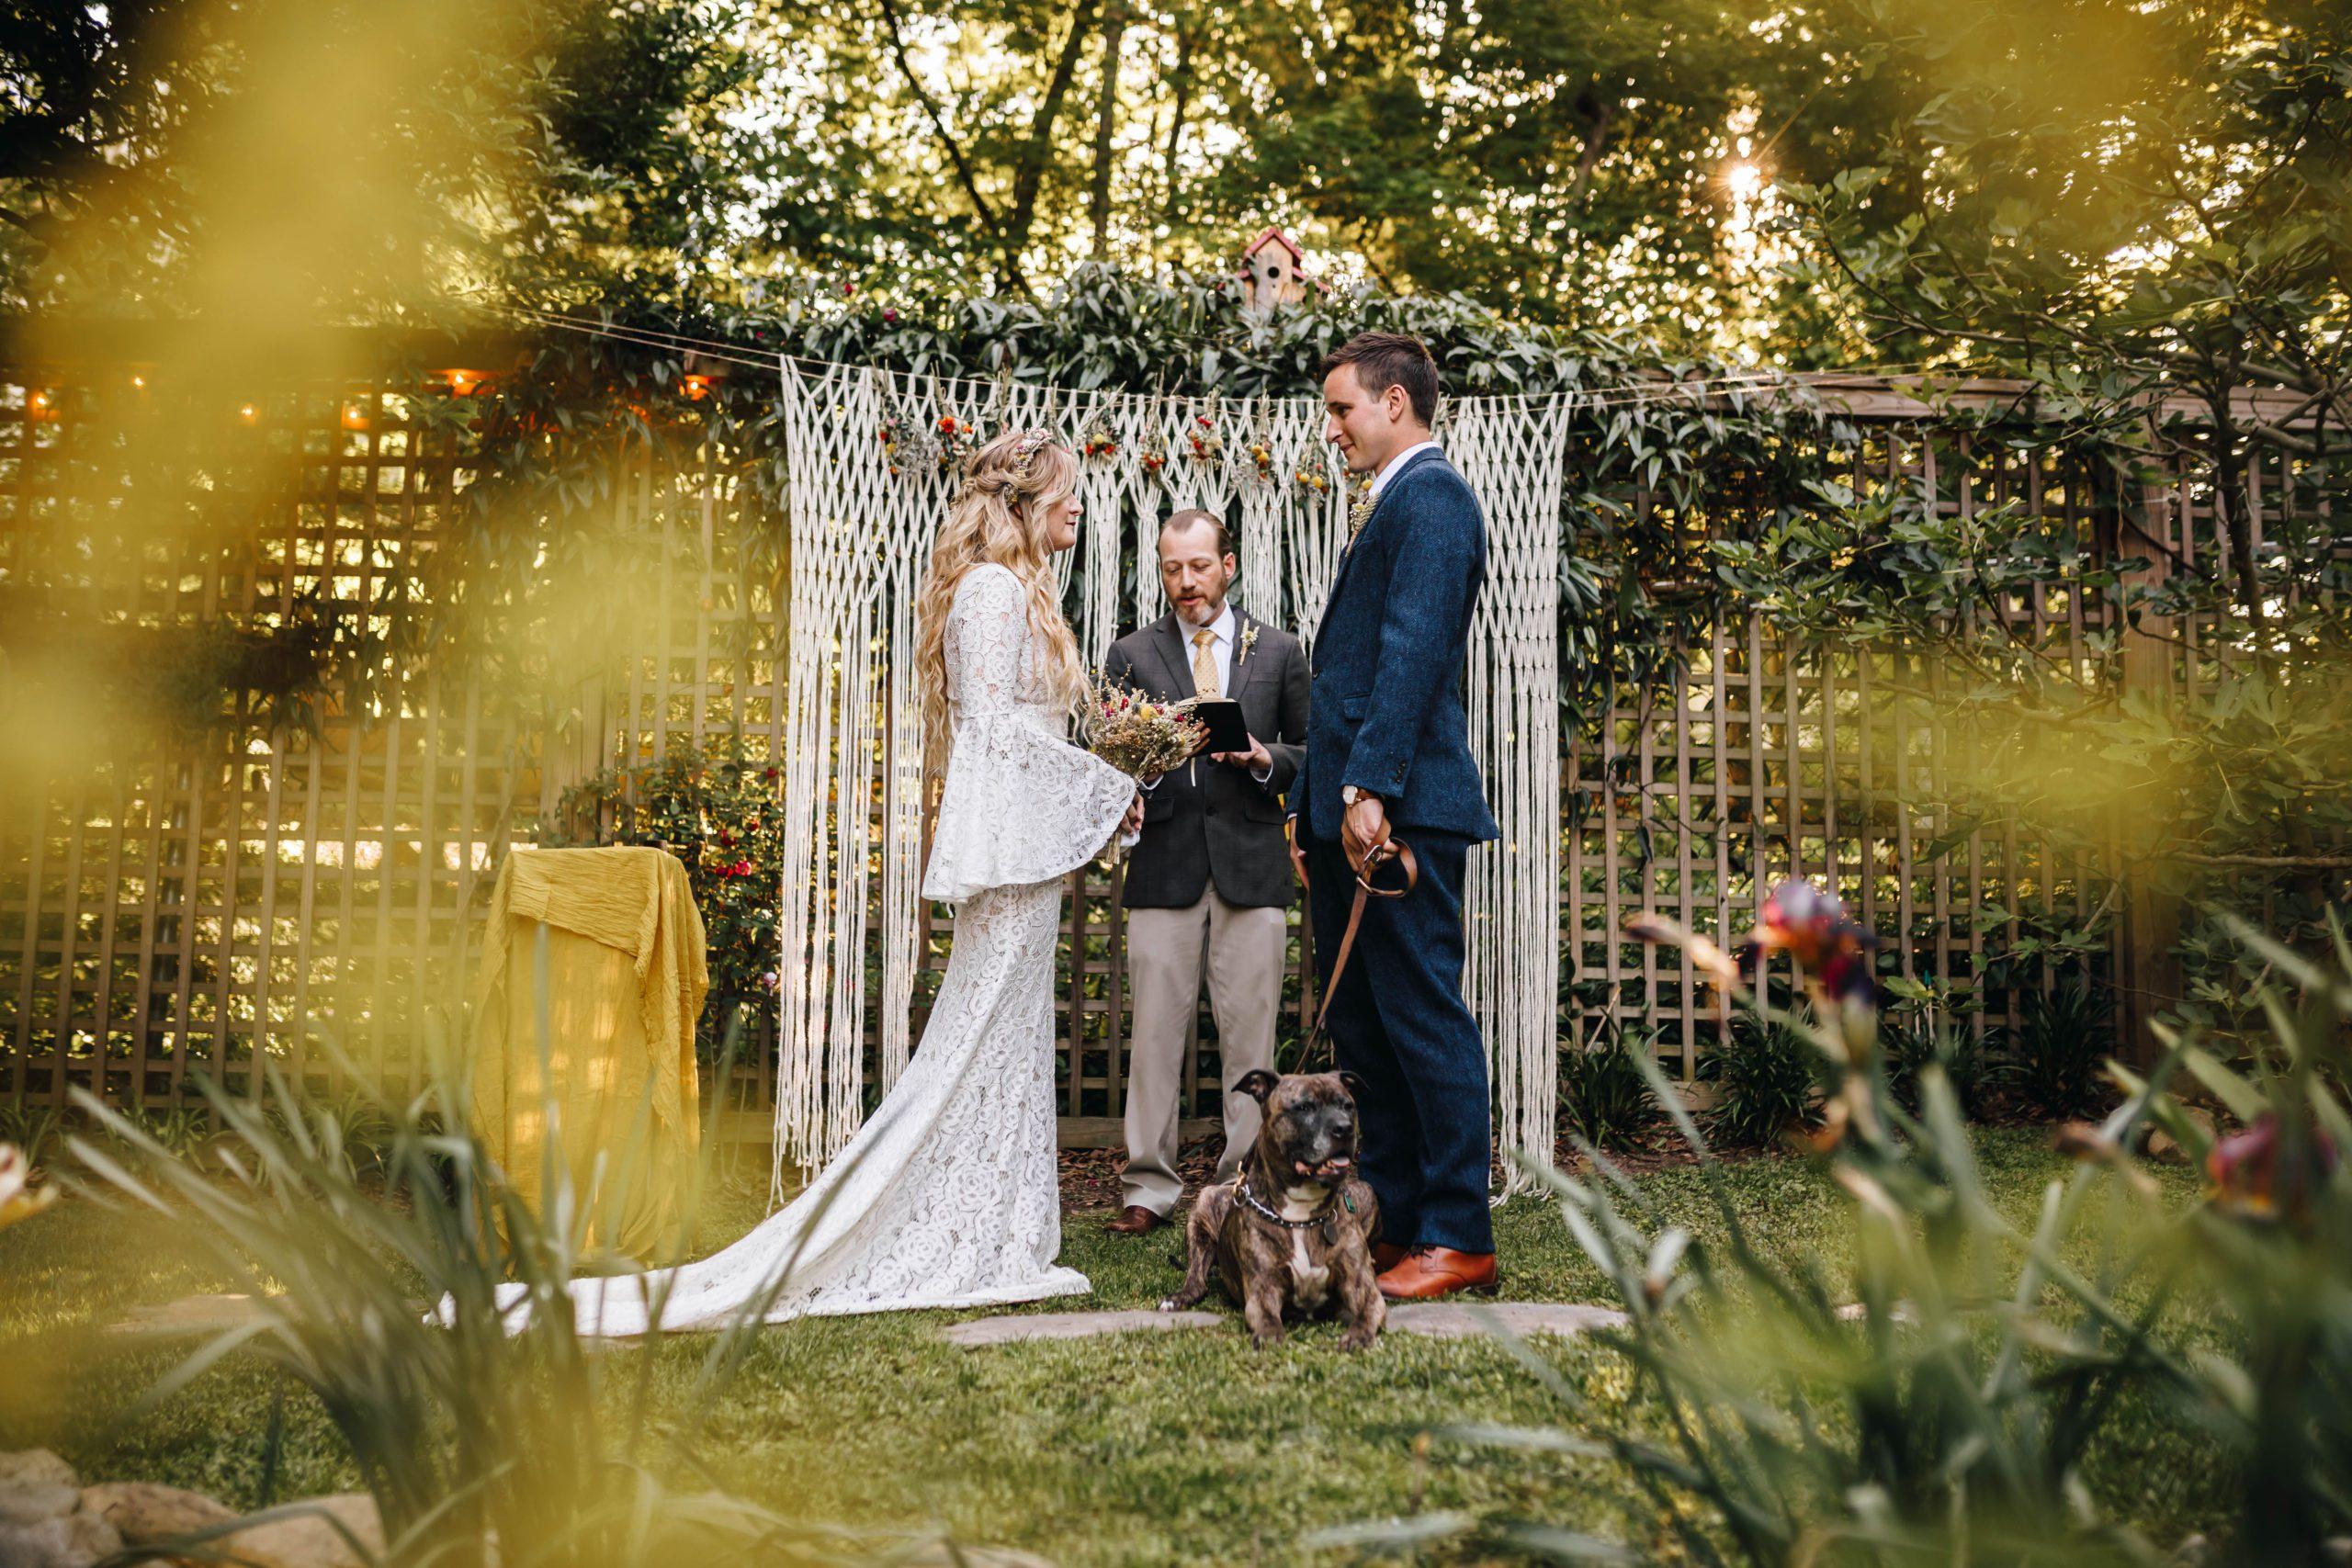 A Backyard Wedding Story